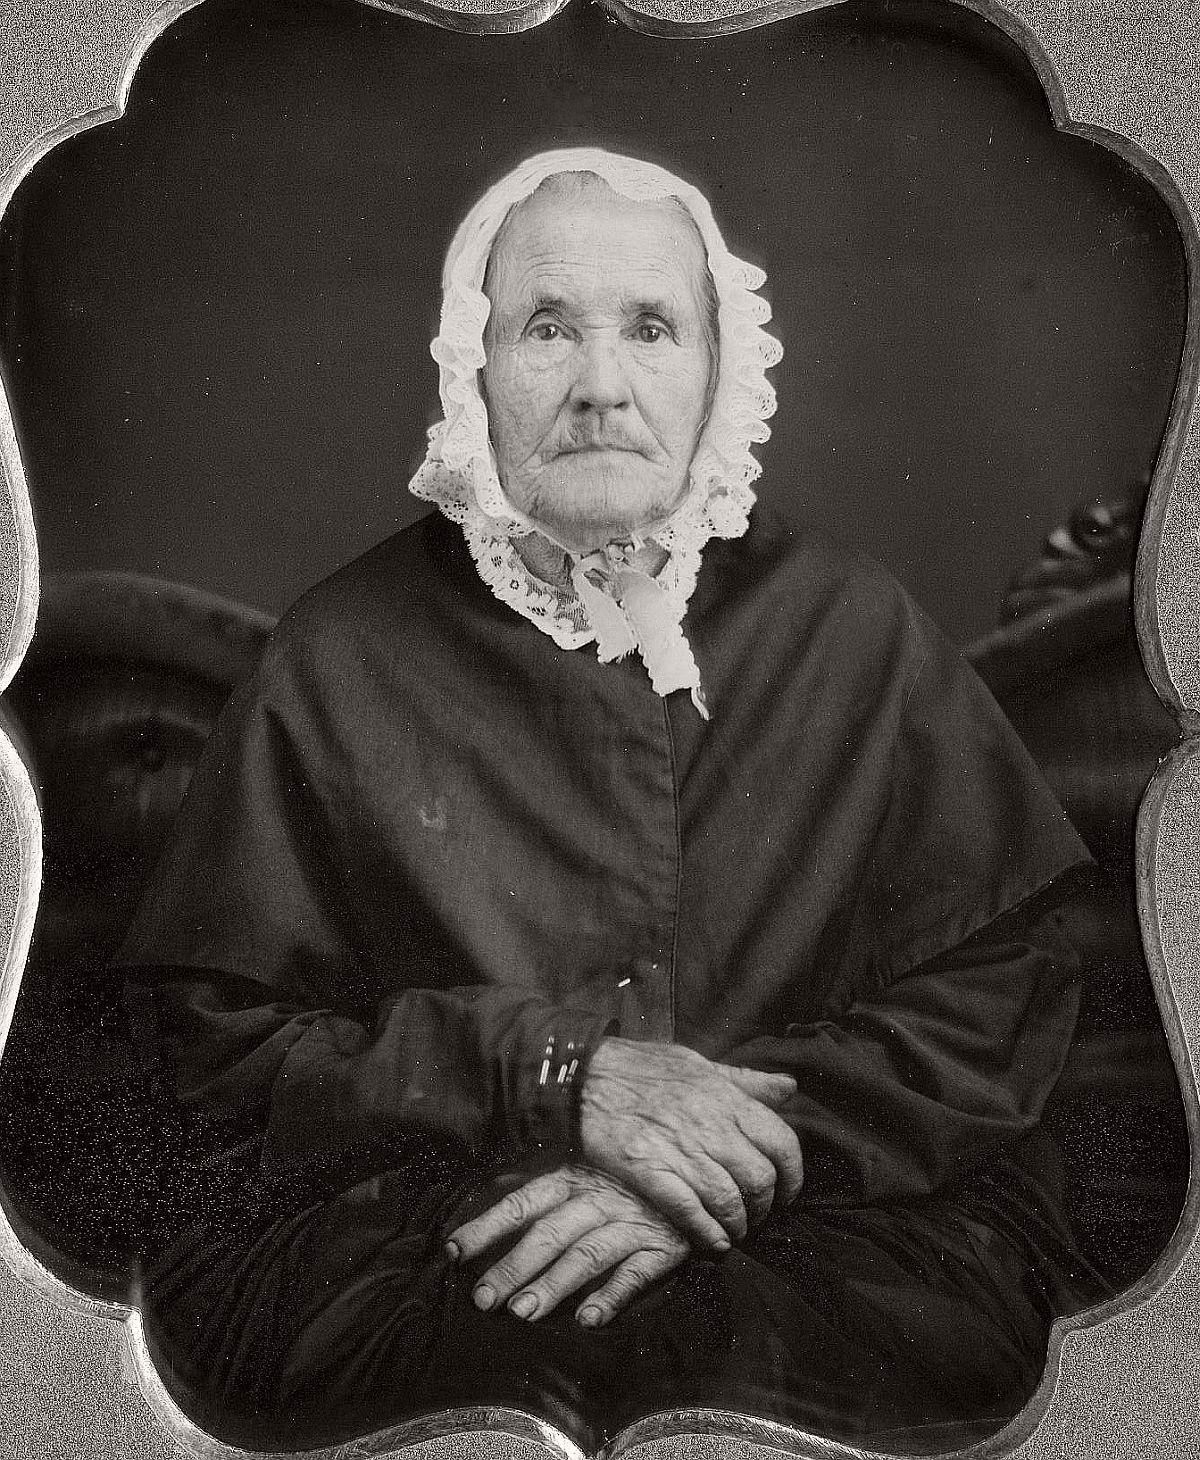 daguerreotype-portrait-people-born-in-the-late-18th-xviii-century-1700s-vintage-32